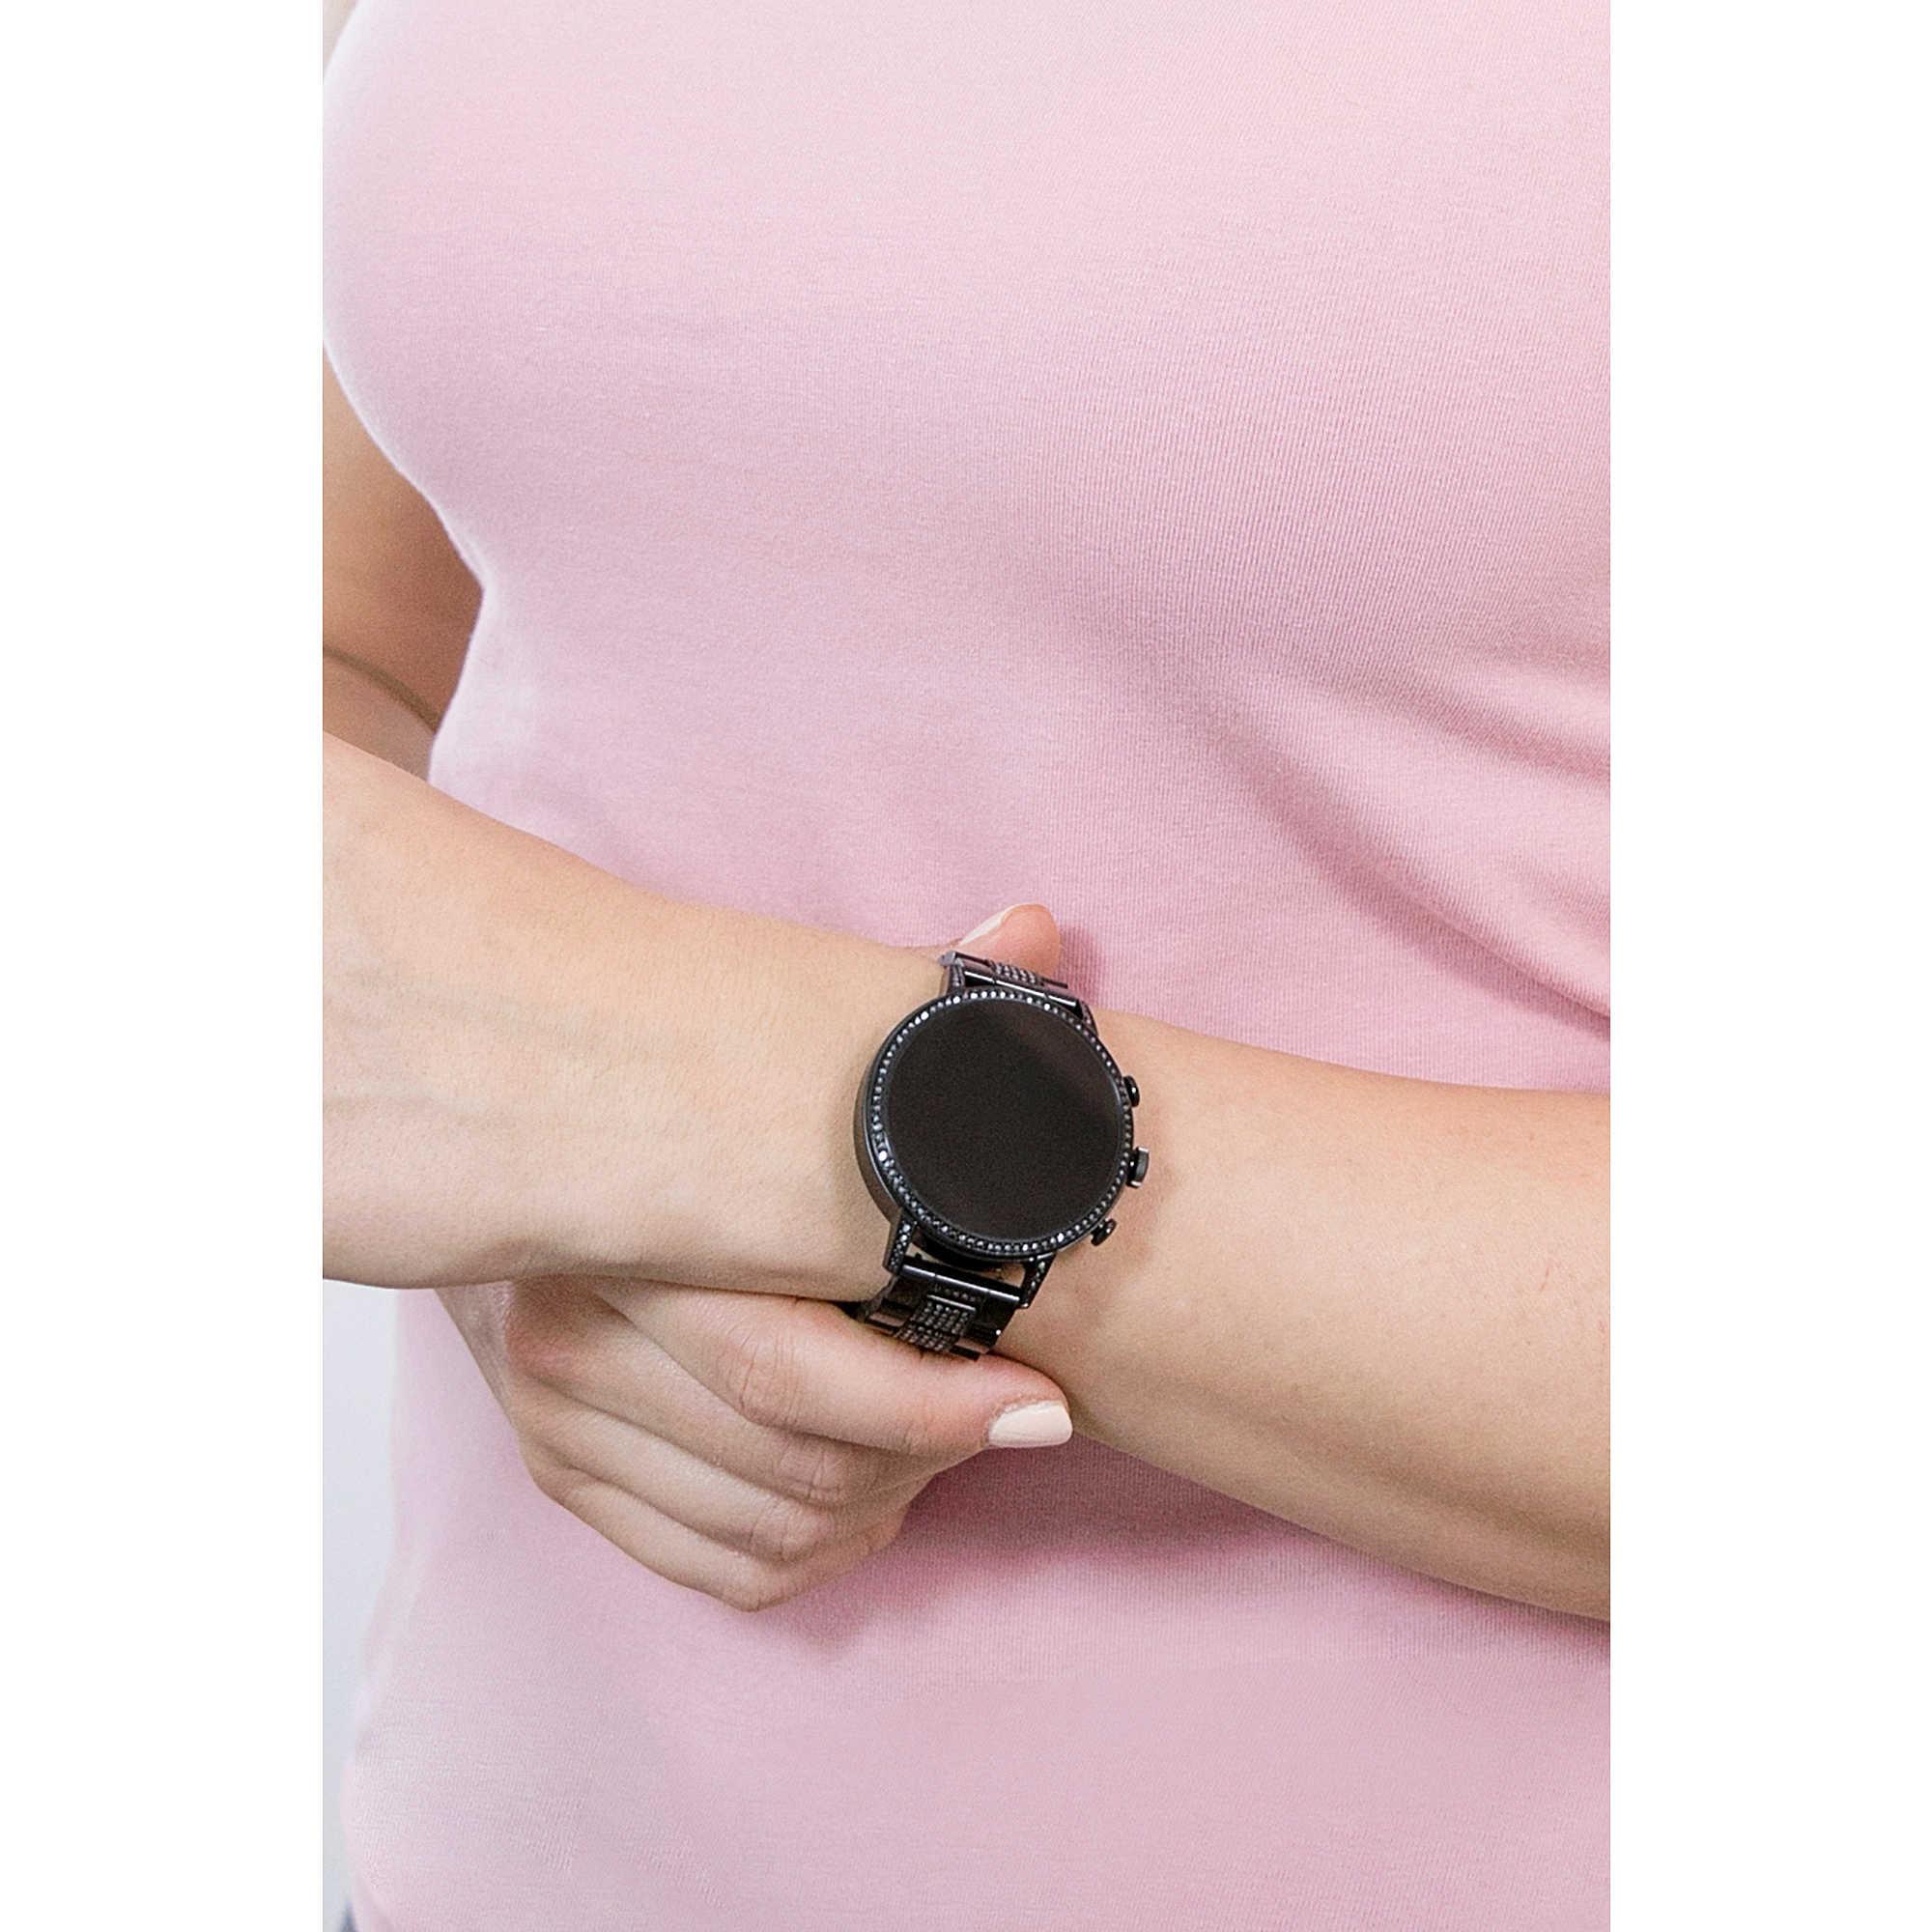 negozio online 01577 07954 orologio Smartwatch donna Fossil Q Venture FTW6023 ...